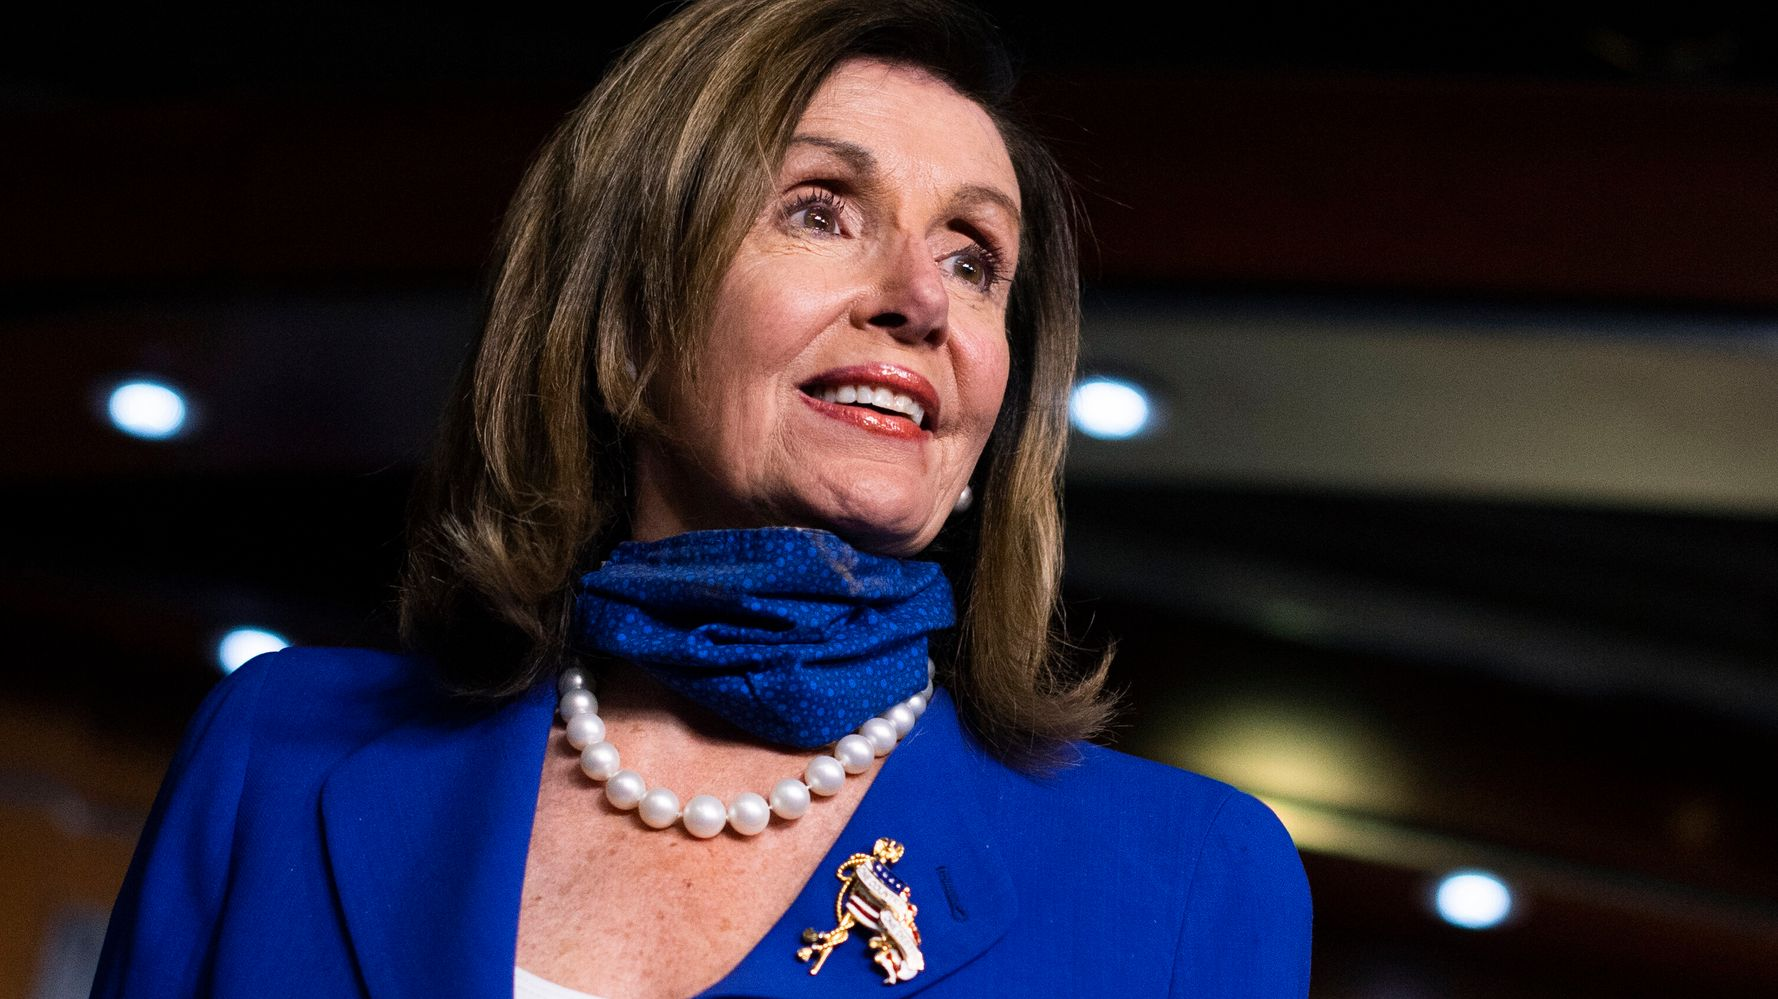 Nancy Pelosi To Make Masks Mandatory In House Chamber 1